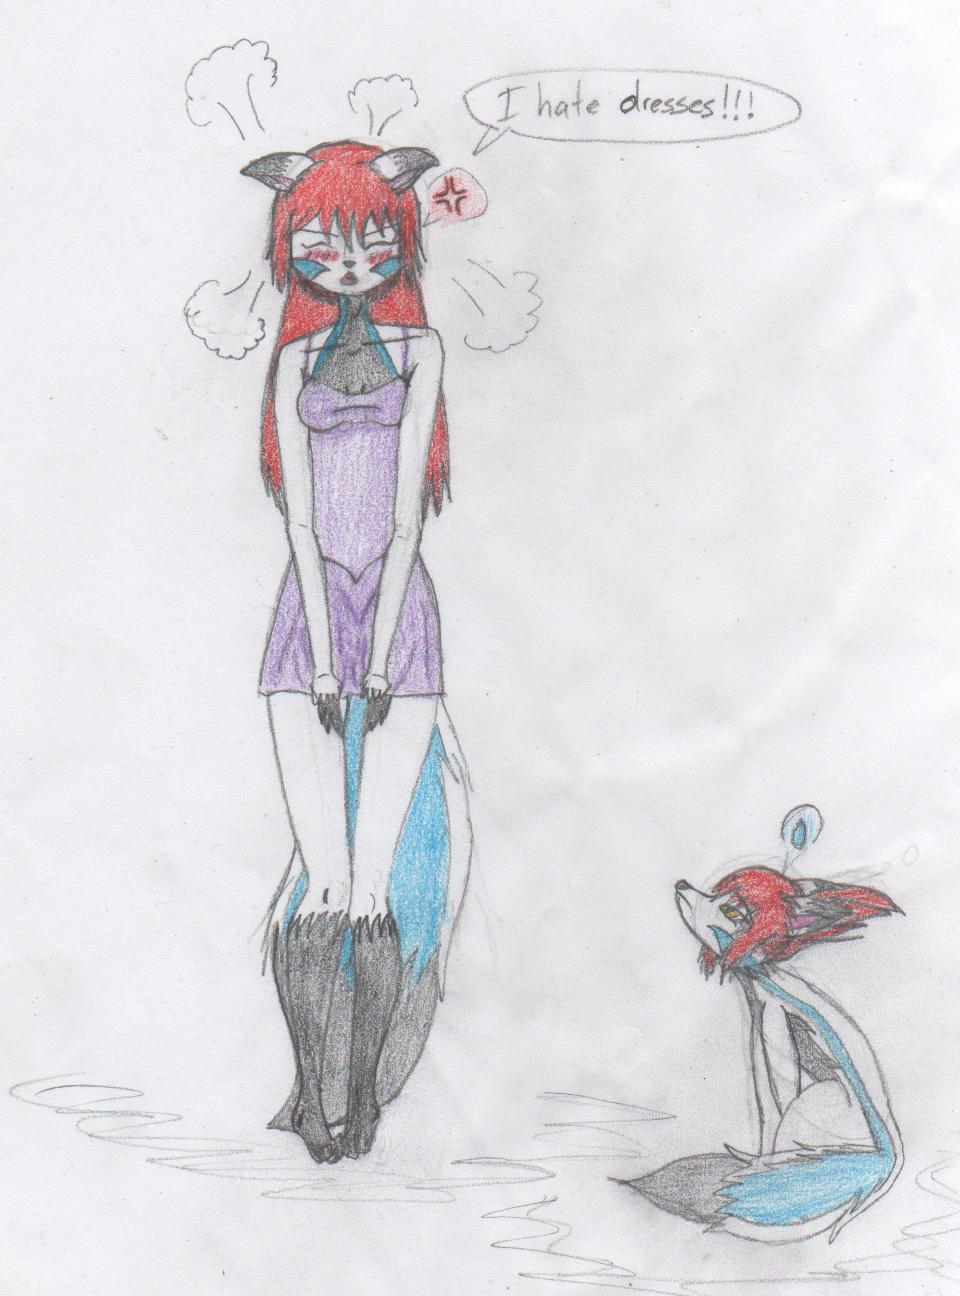 She Hates Dress by LatiosLatiasEON